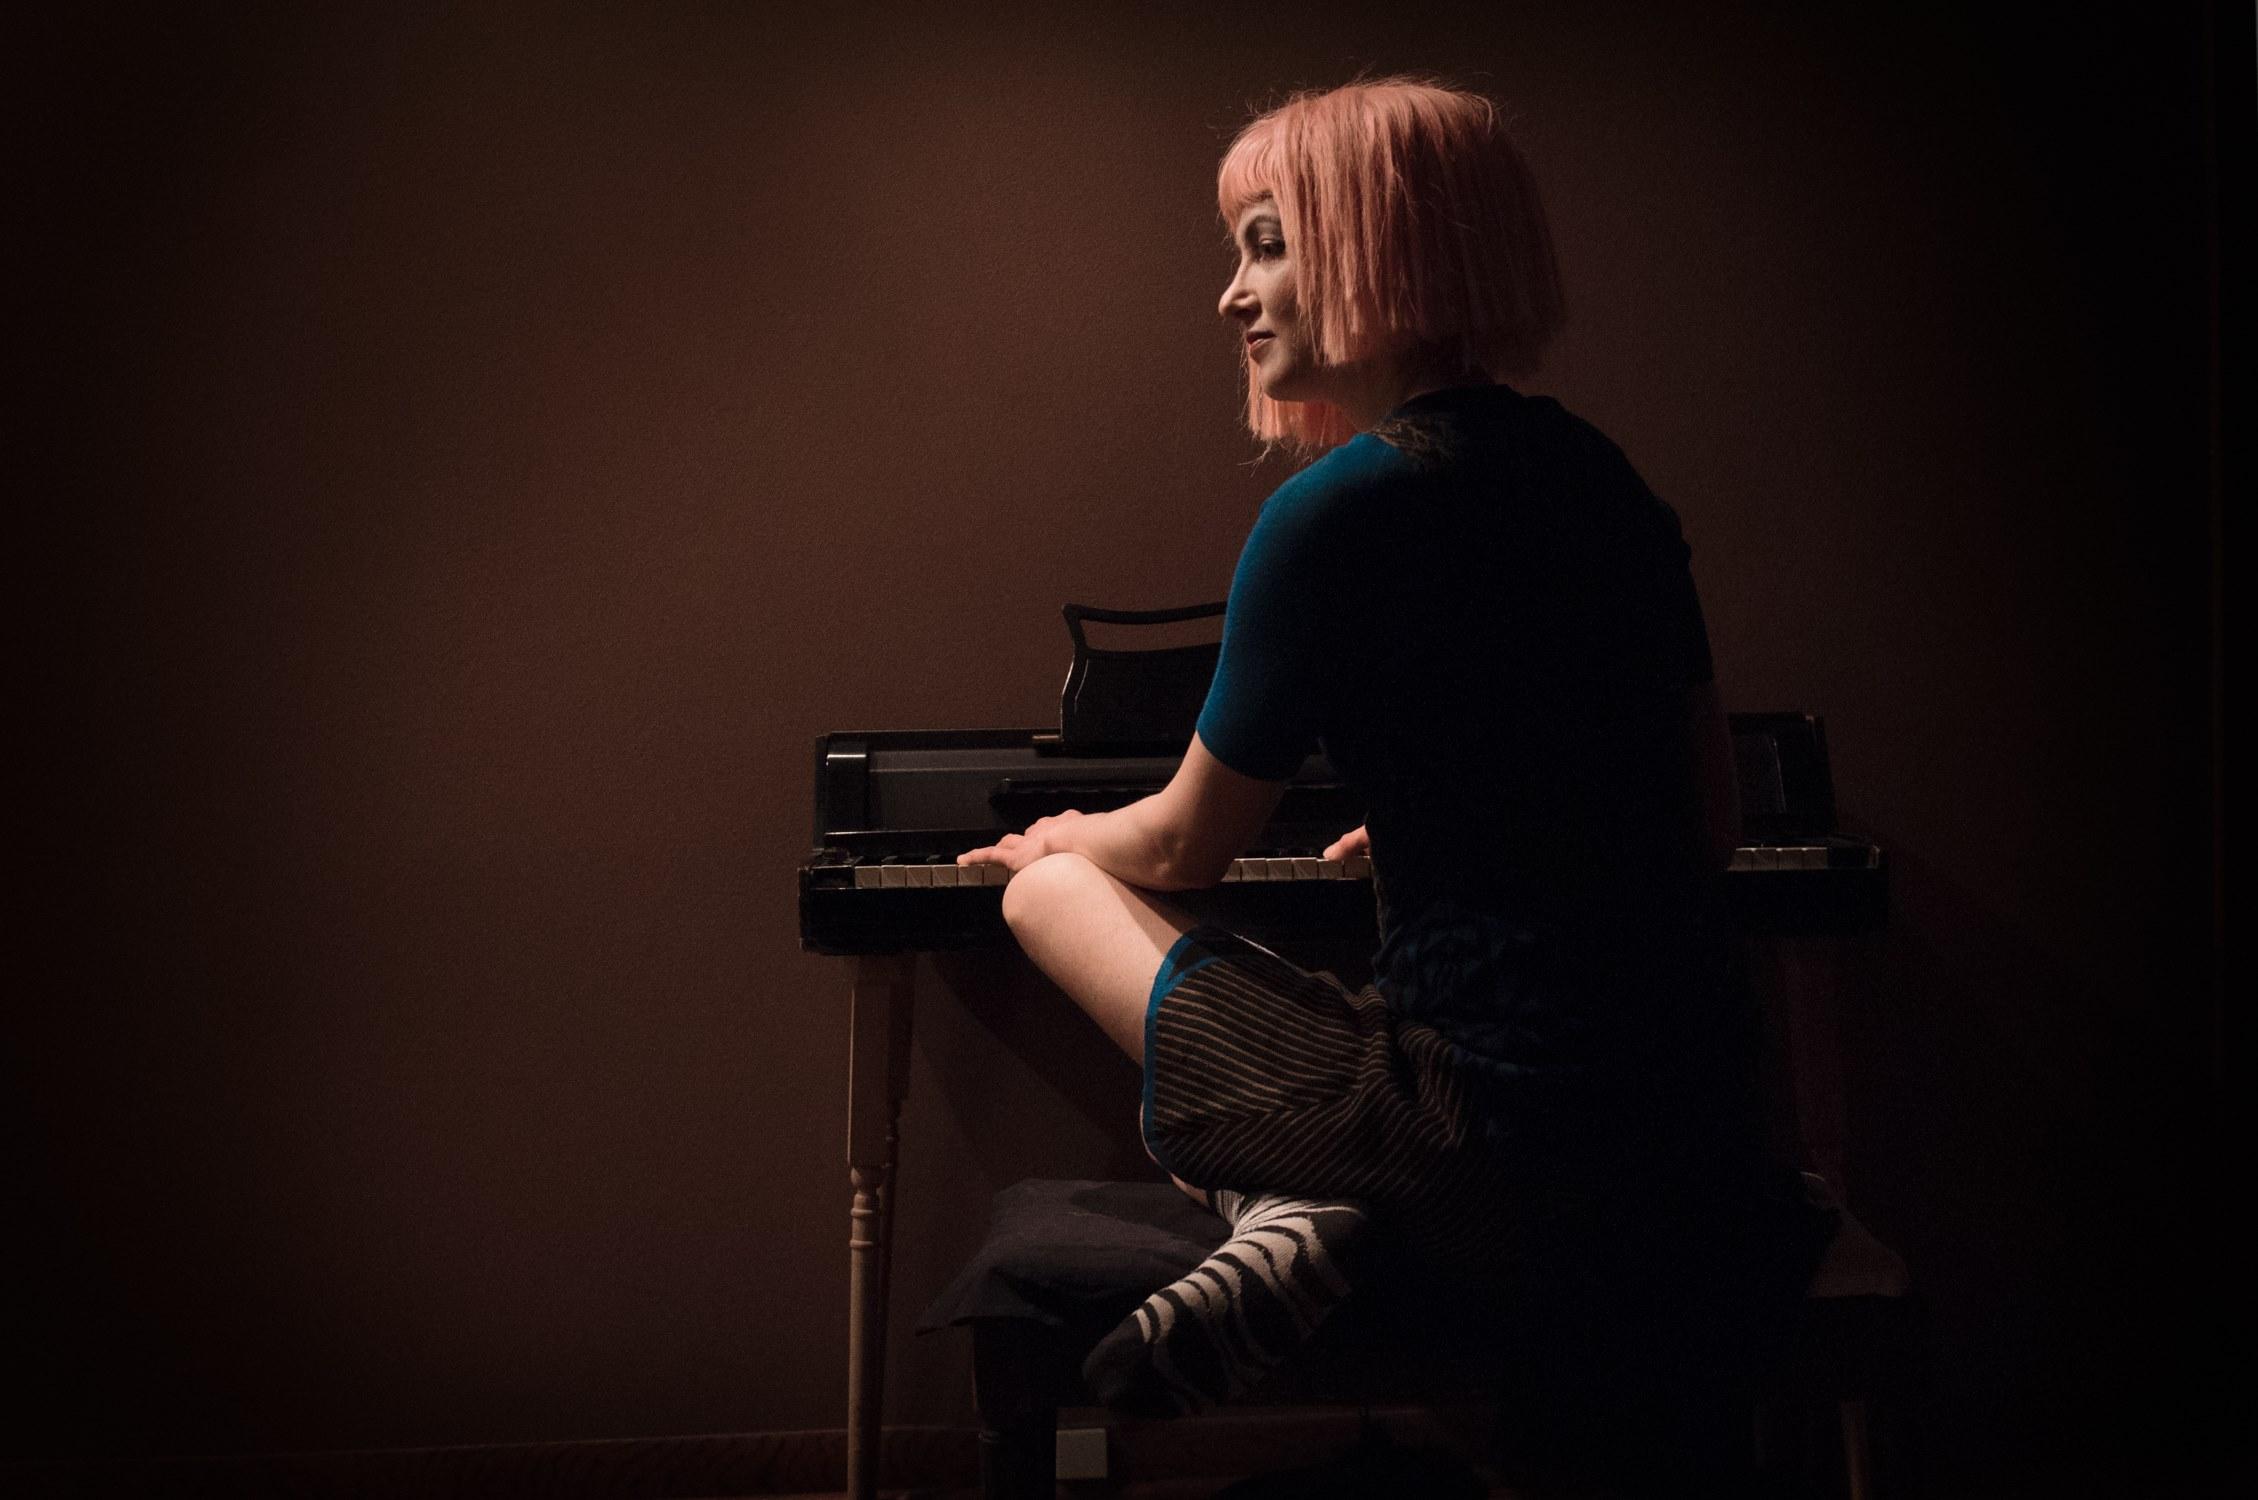 Photo by Amanda Swan Photography.